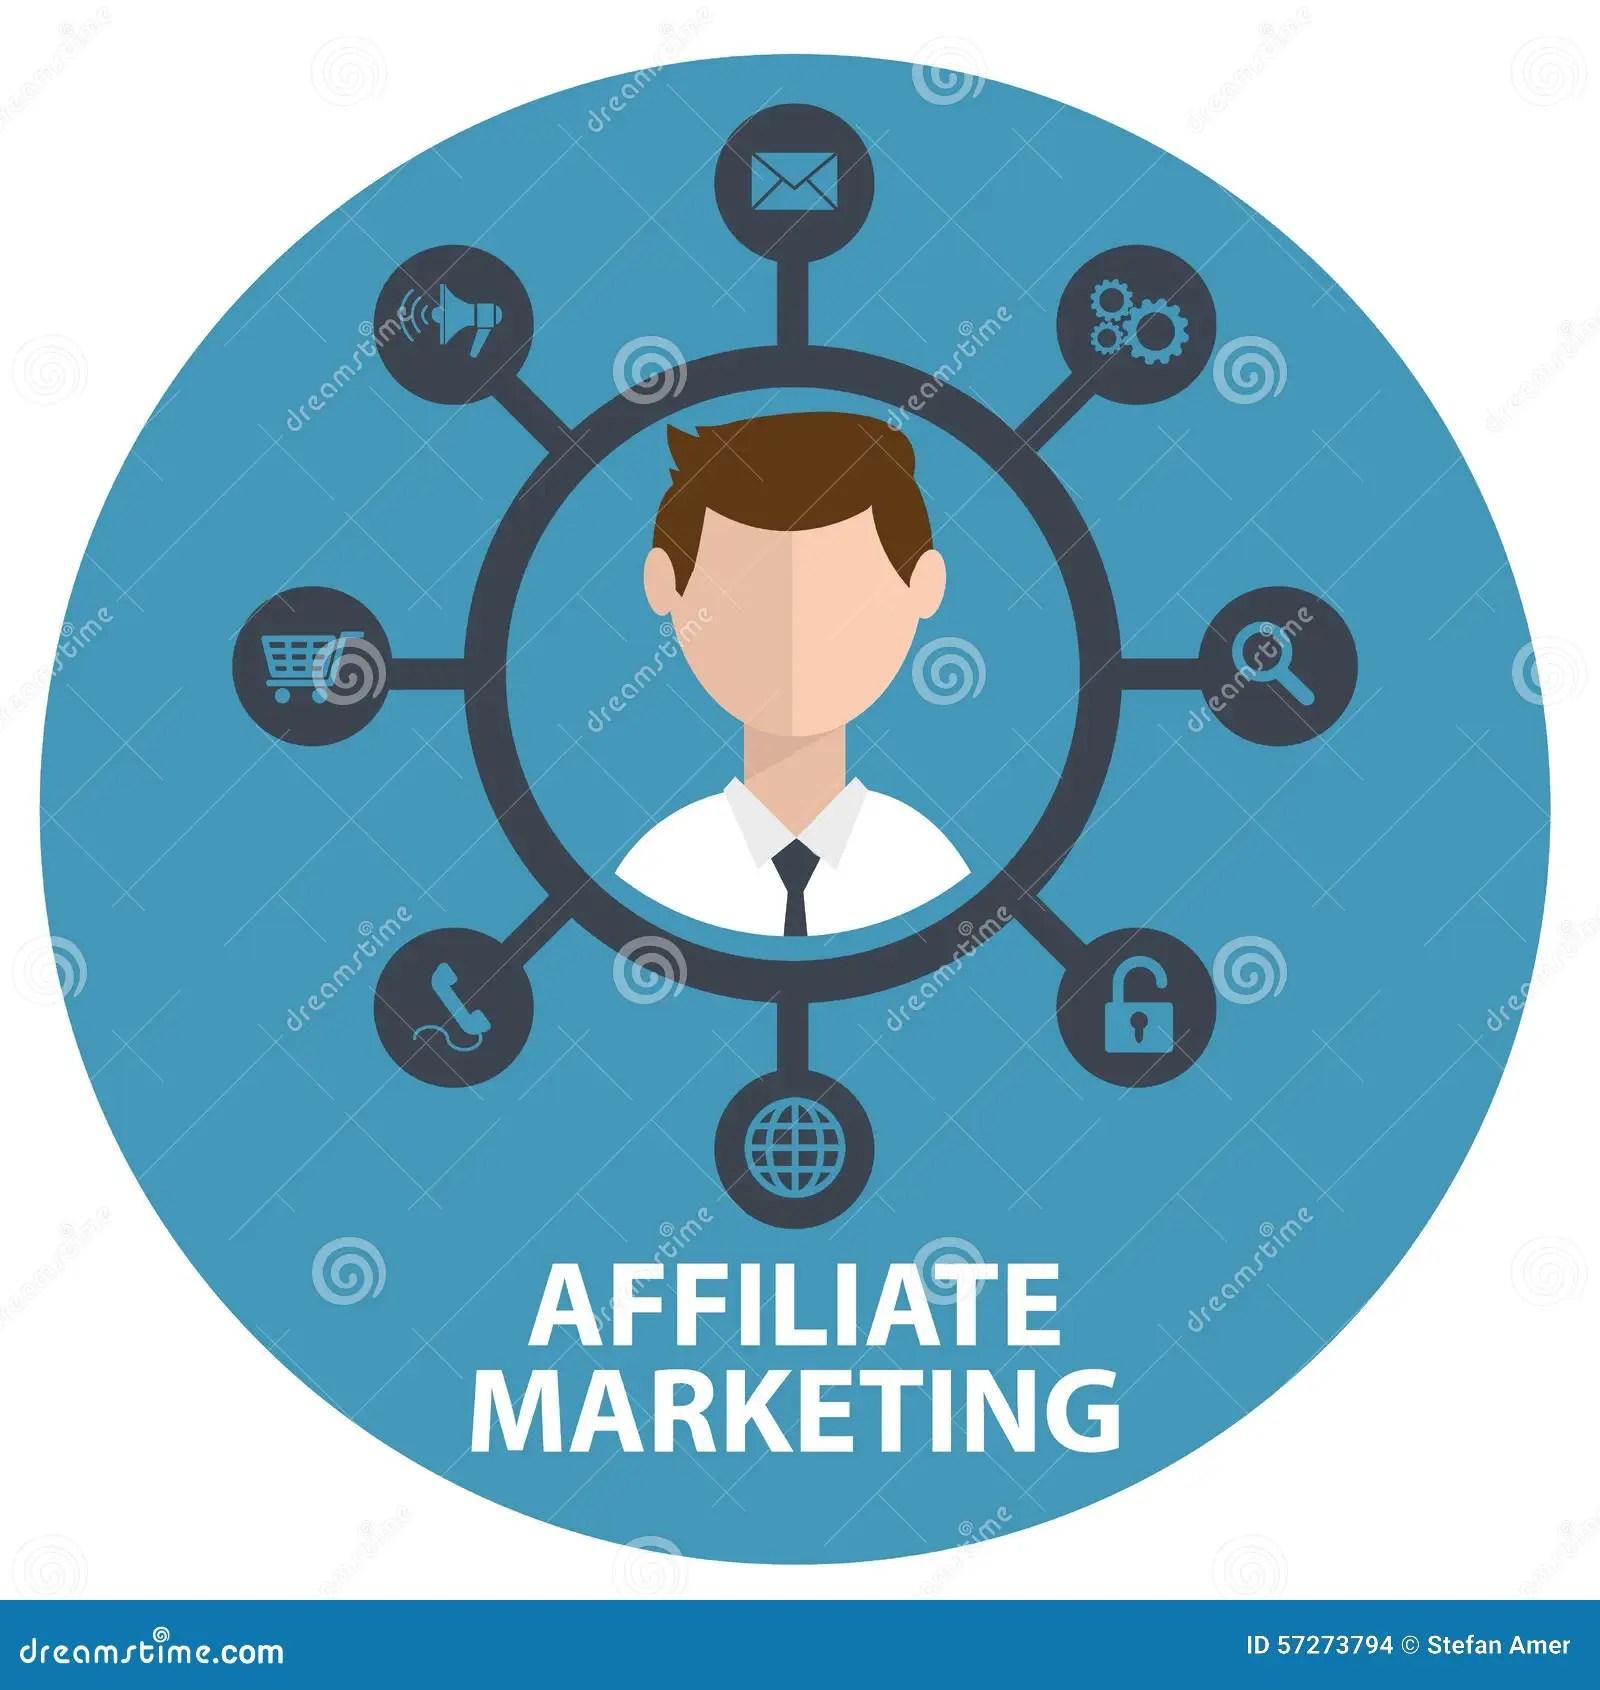 Vector Illustration Icon Of Affiliate Marketing In Circle Stock Vector - Illustration of internet. element: 57273794